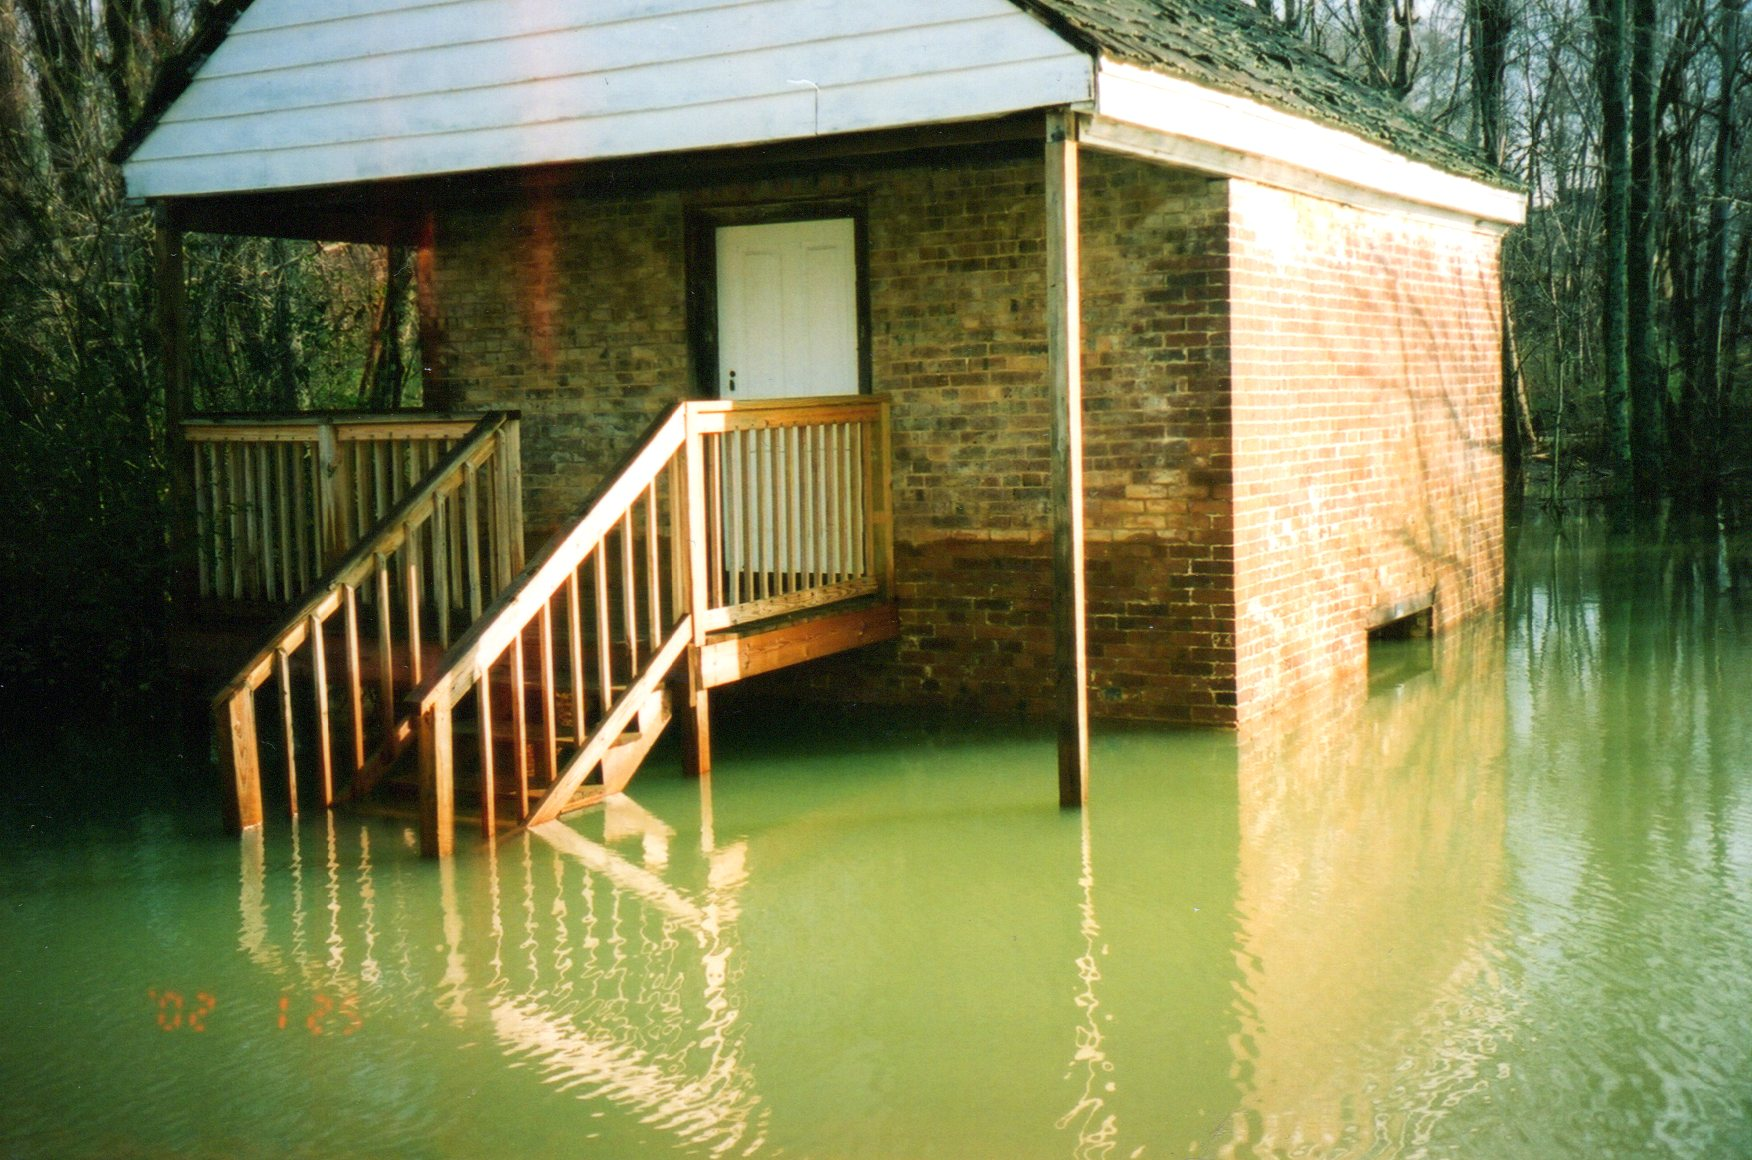 Springhouse, 1990s